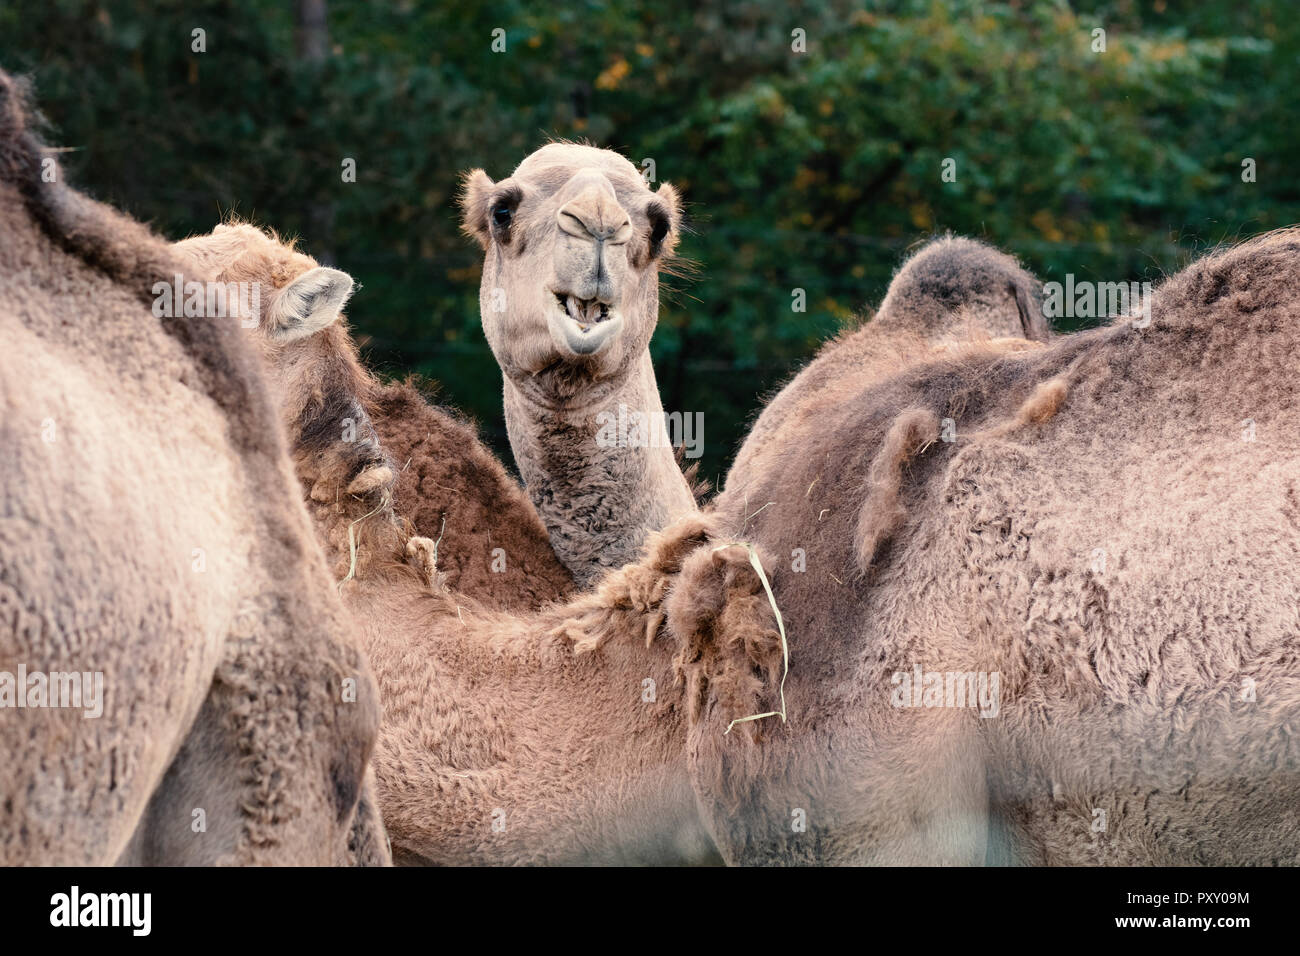 Di cammello, di cammelli in piedi nel gruppo Immagini Stock